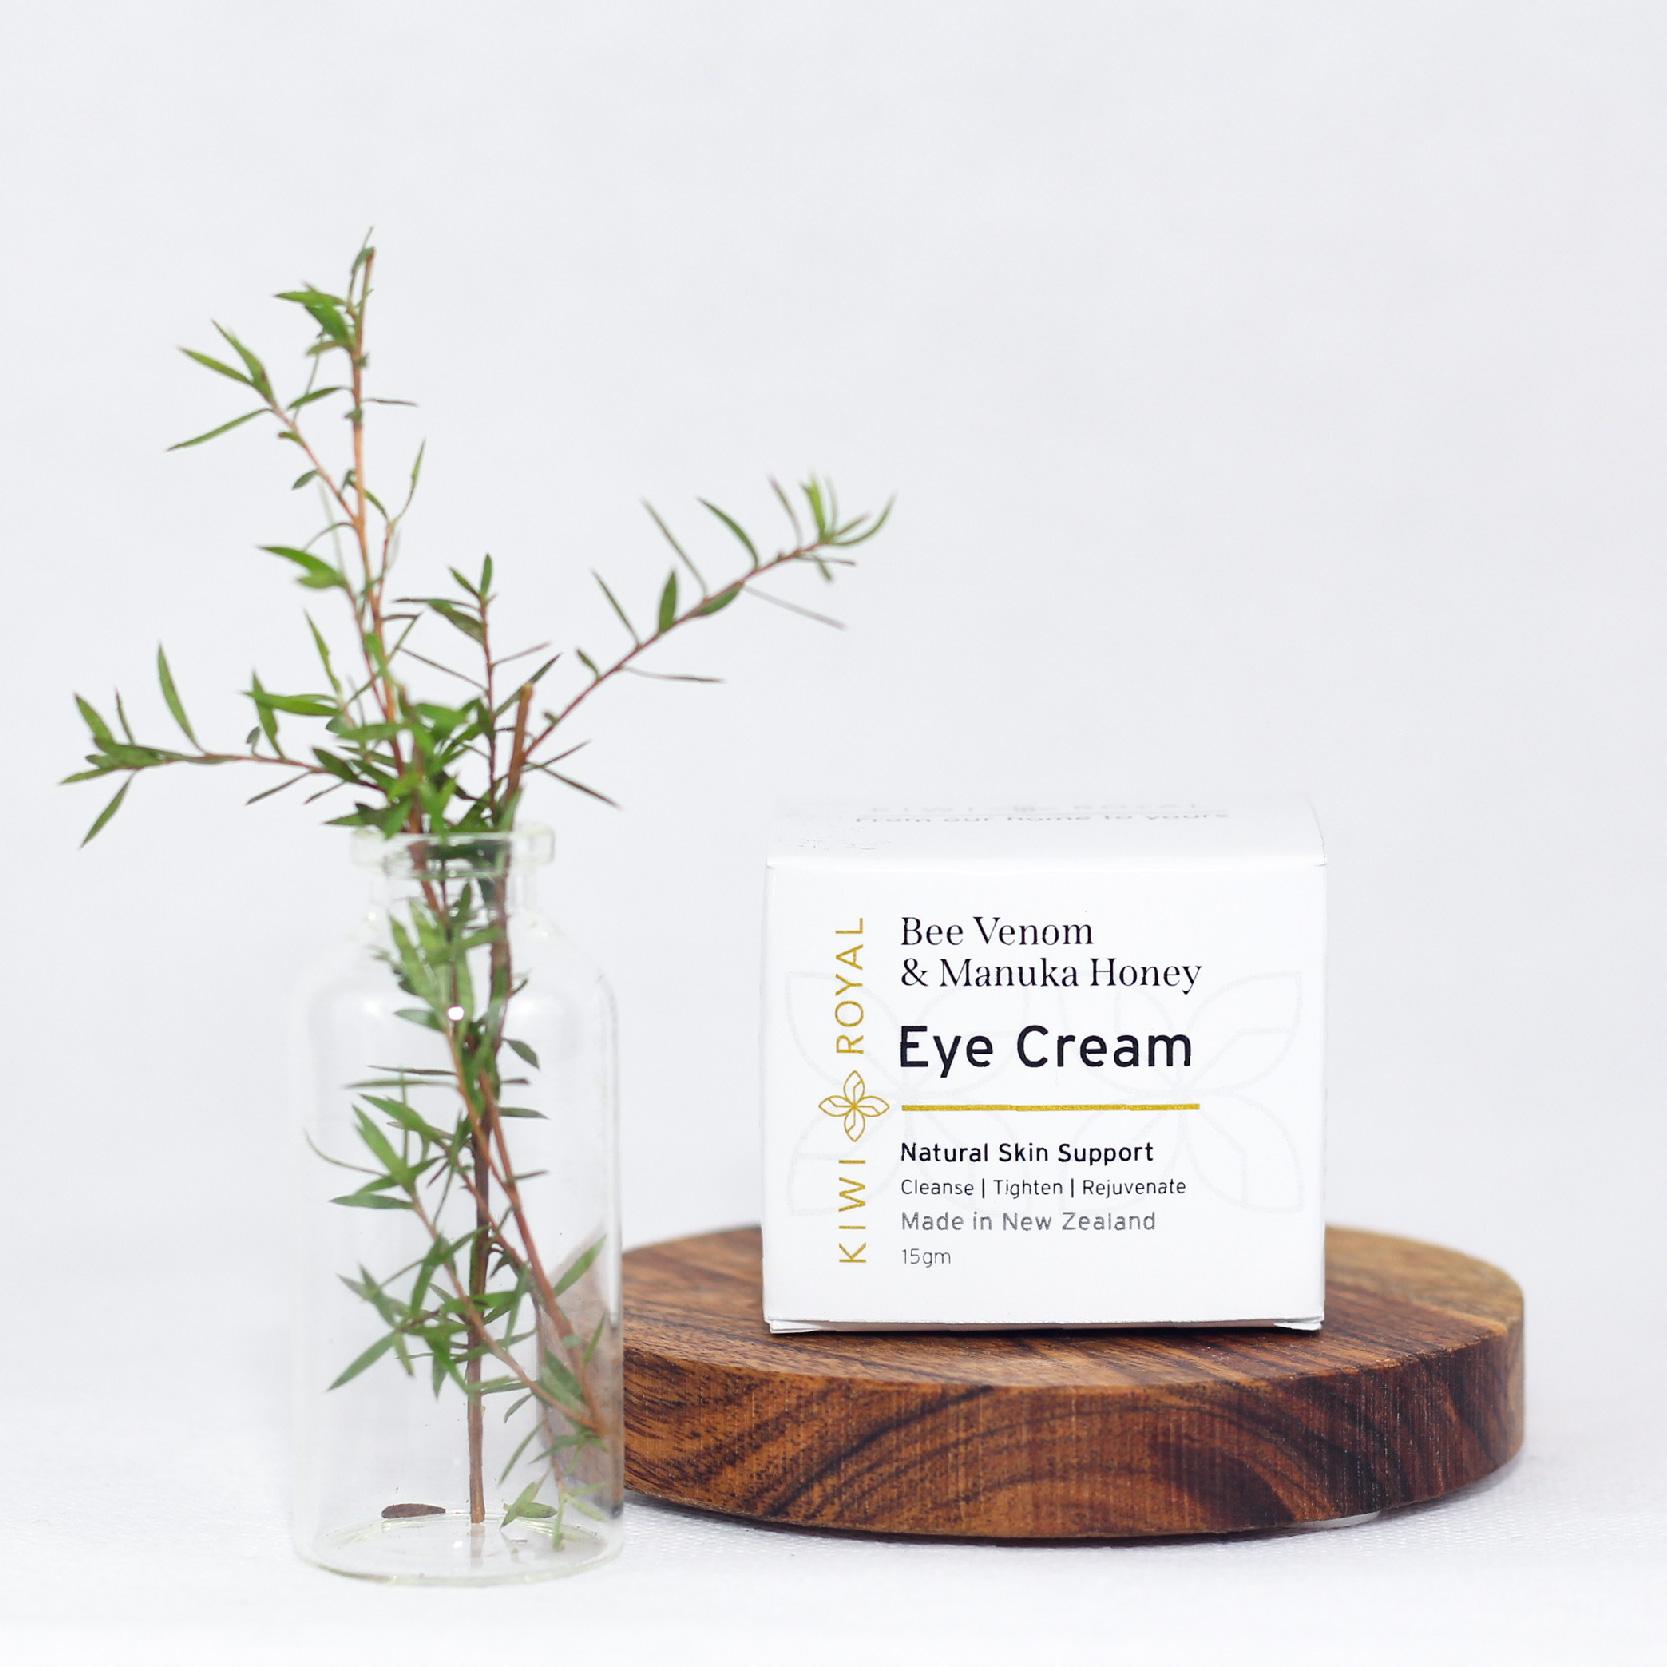 Bee Venom and Manuka Honey Eye Cream